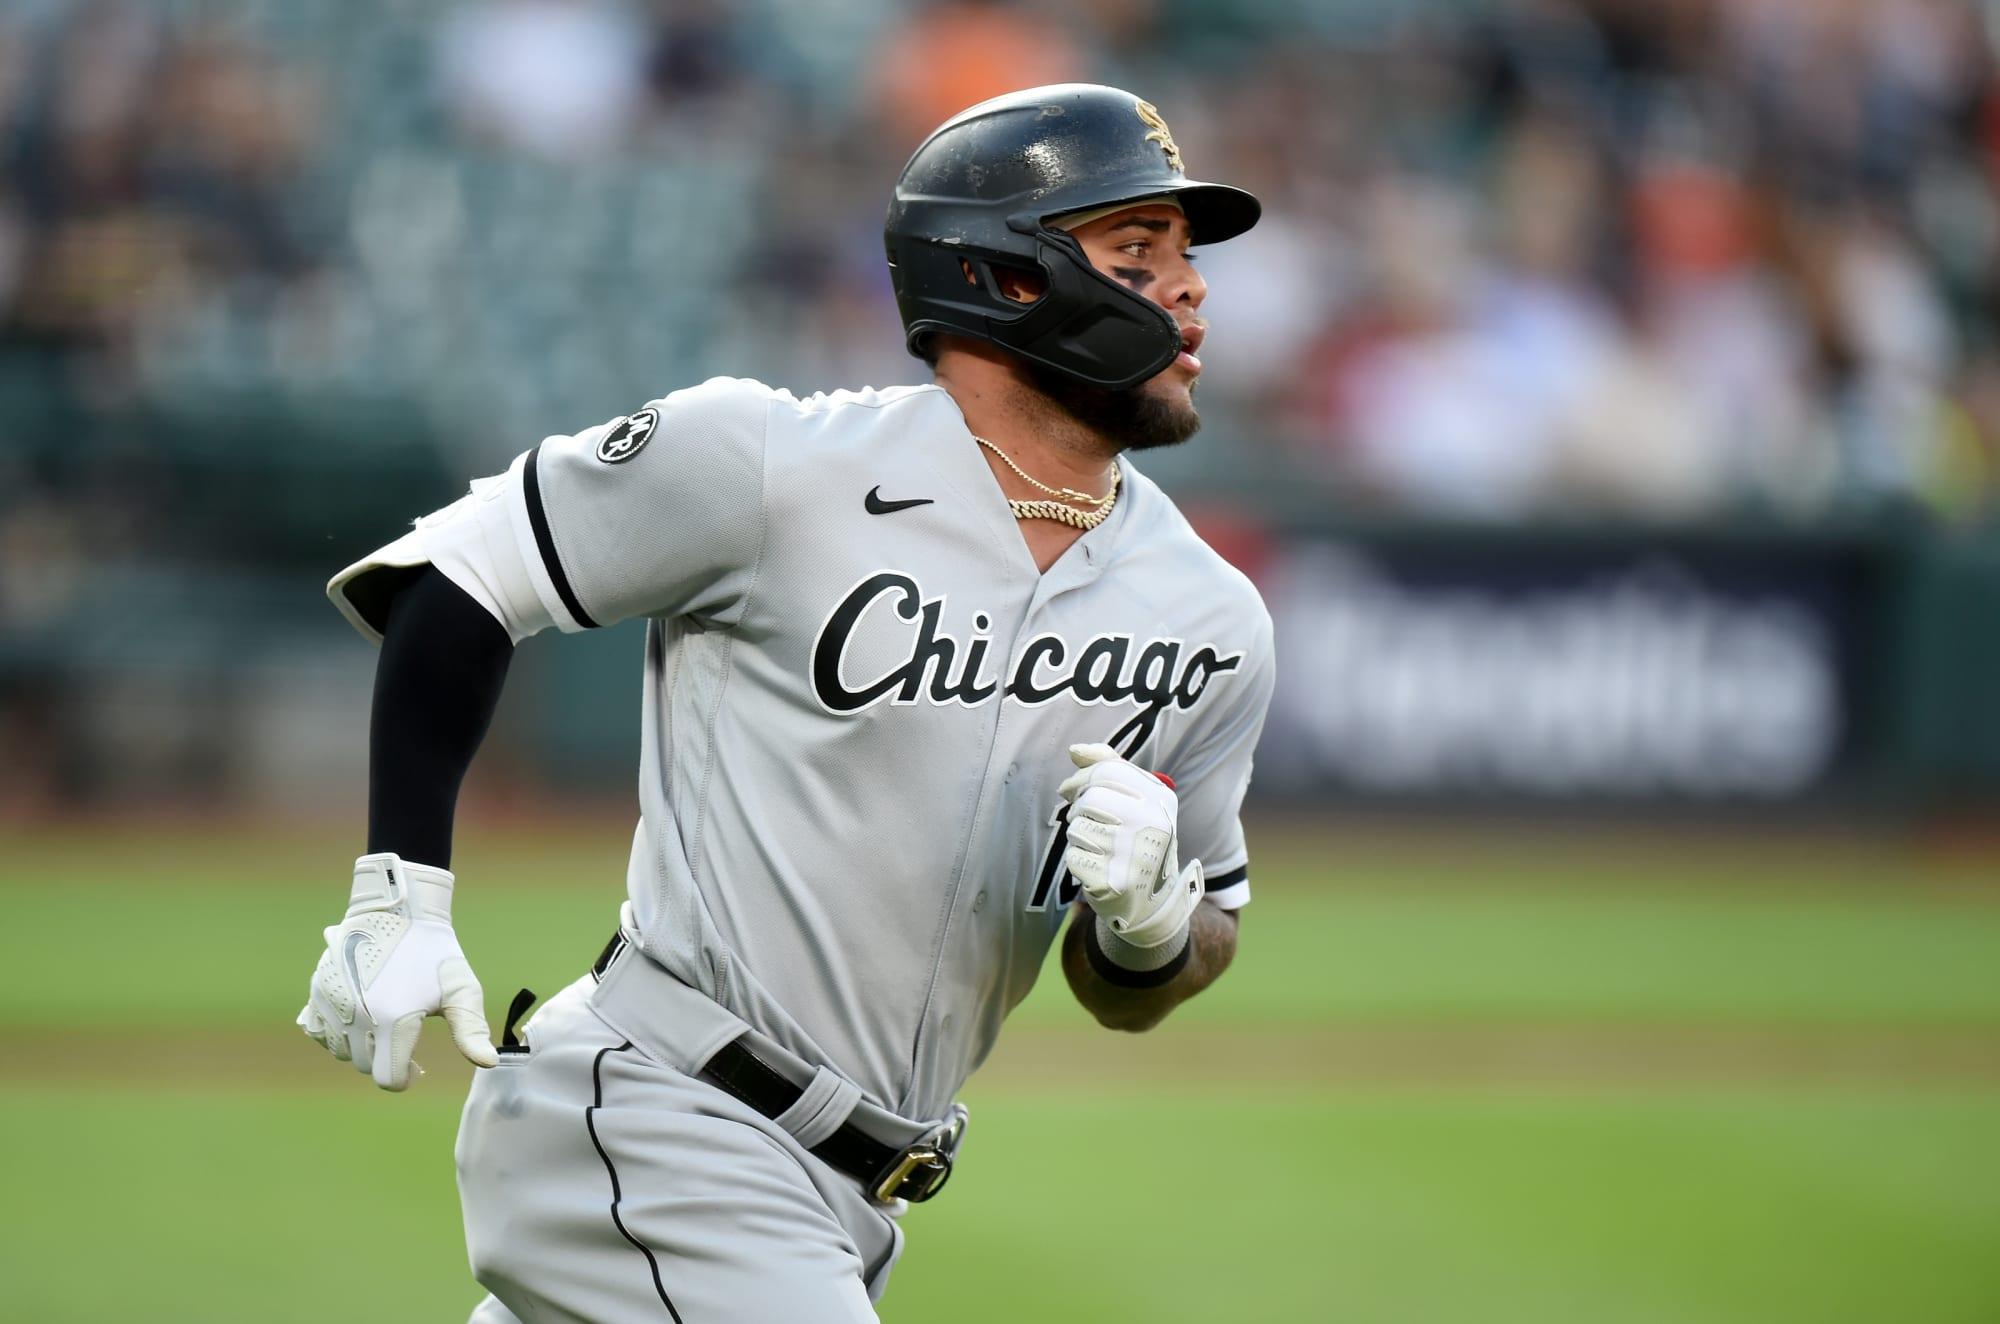 Chicago White Sox: They are in a great spot heading into the break - Da Windy City